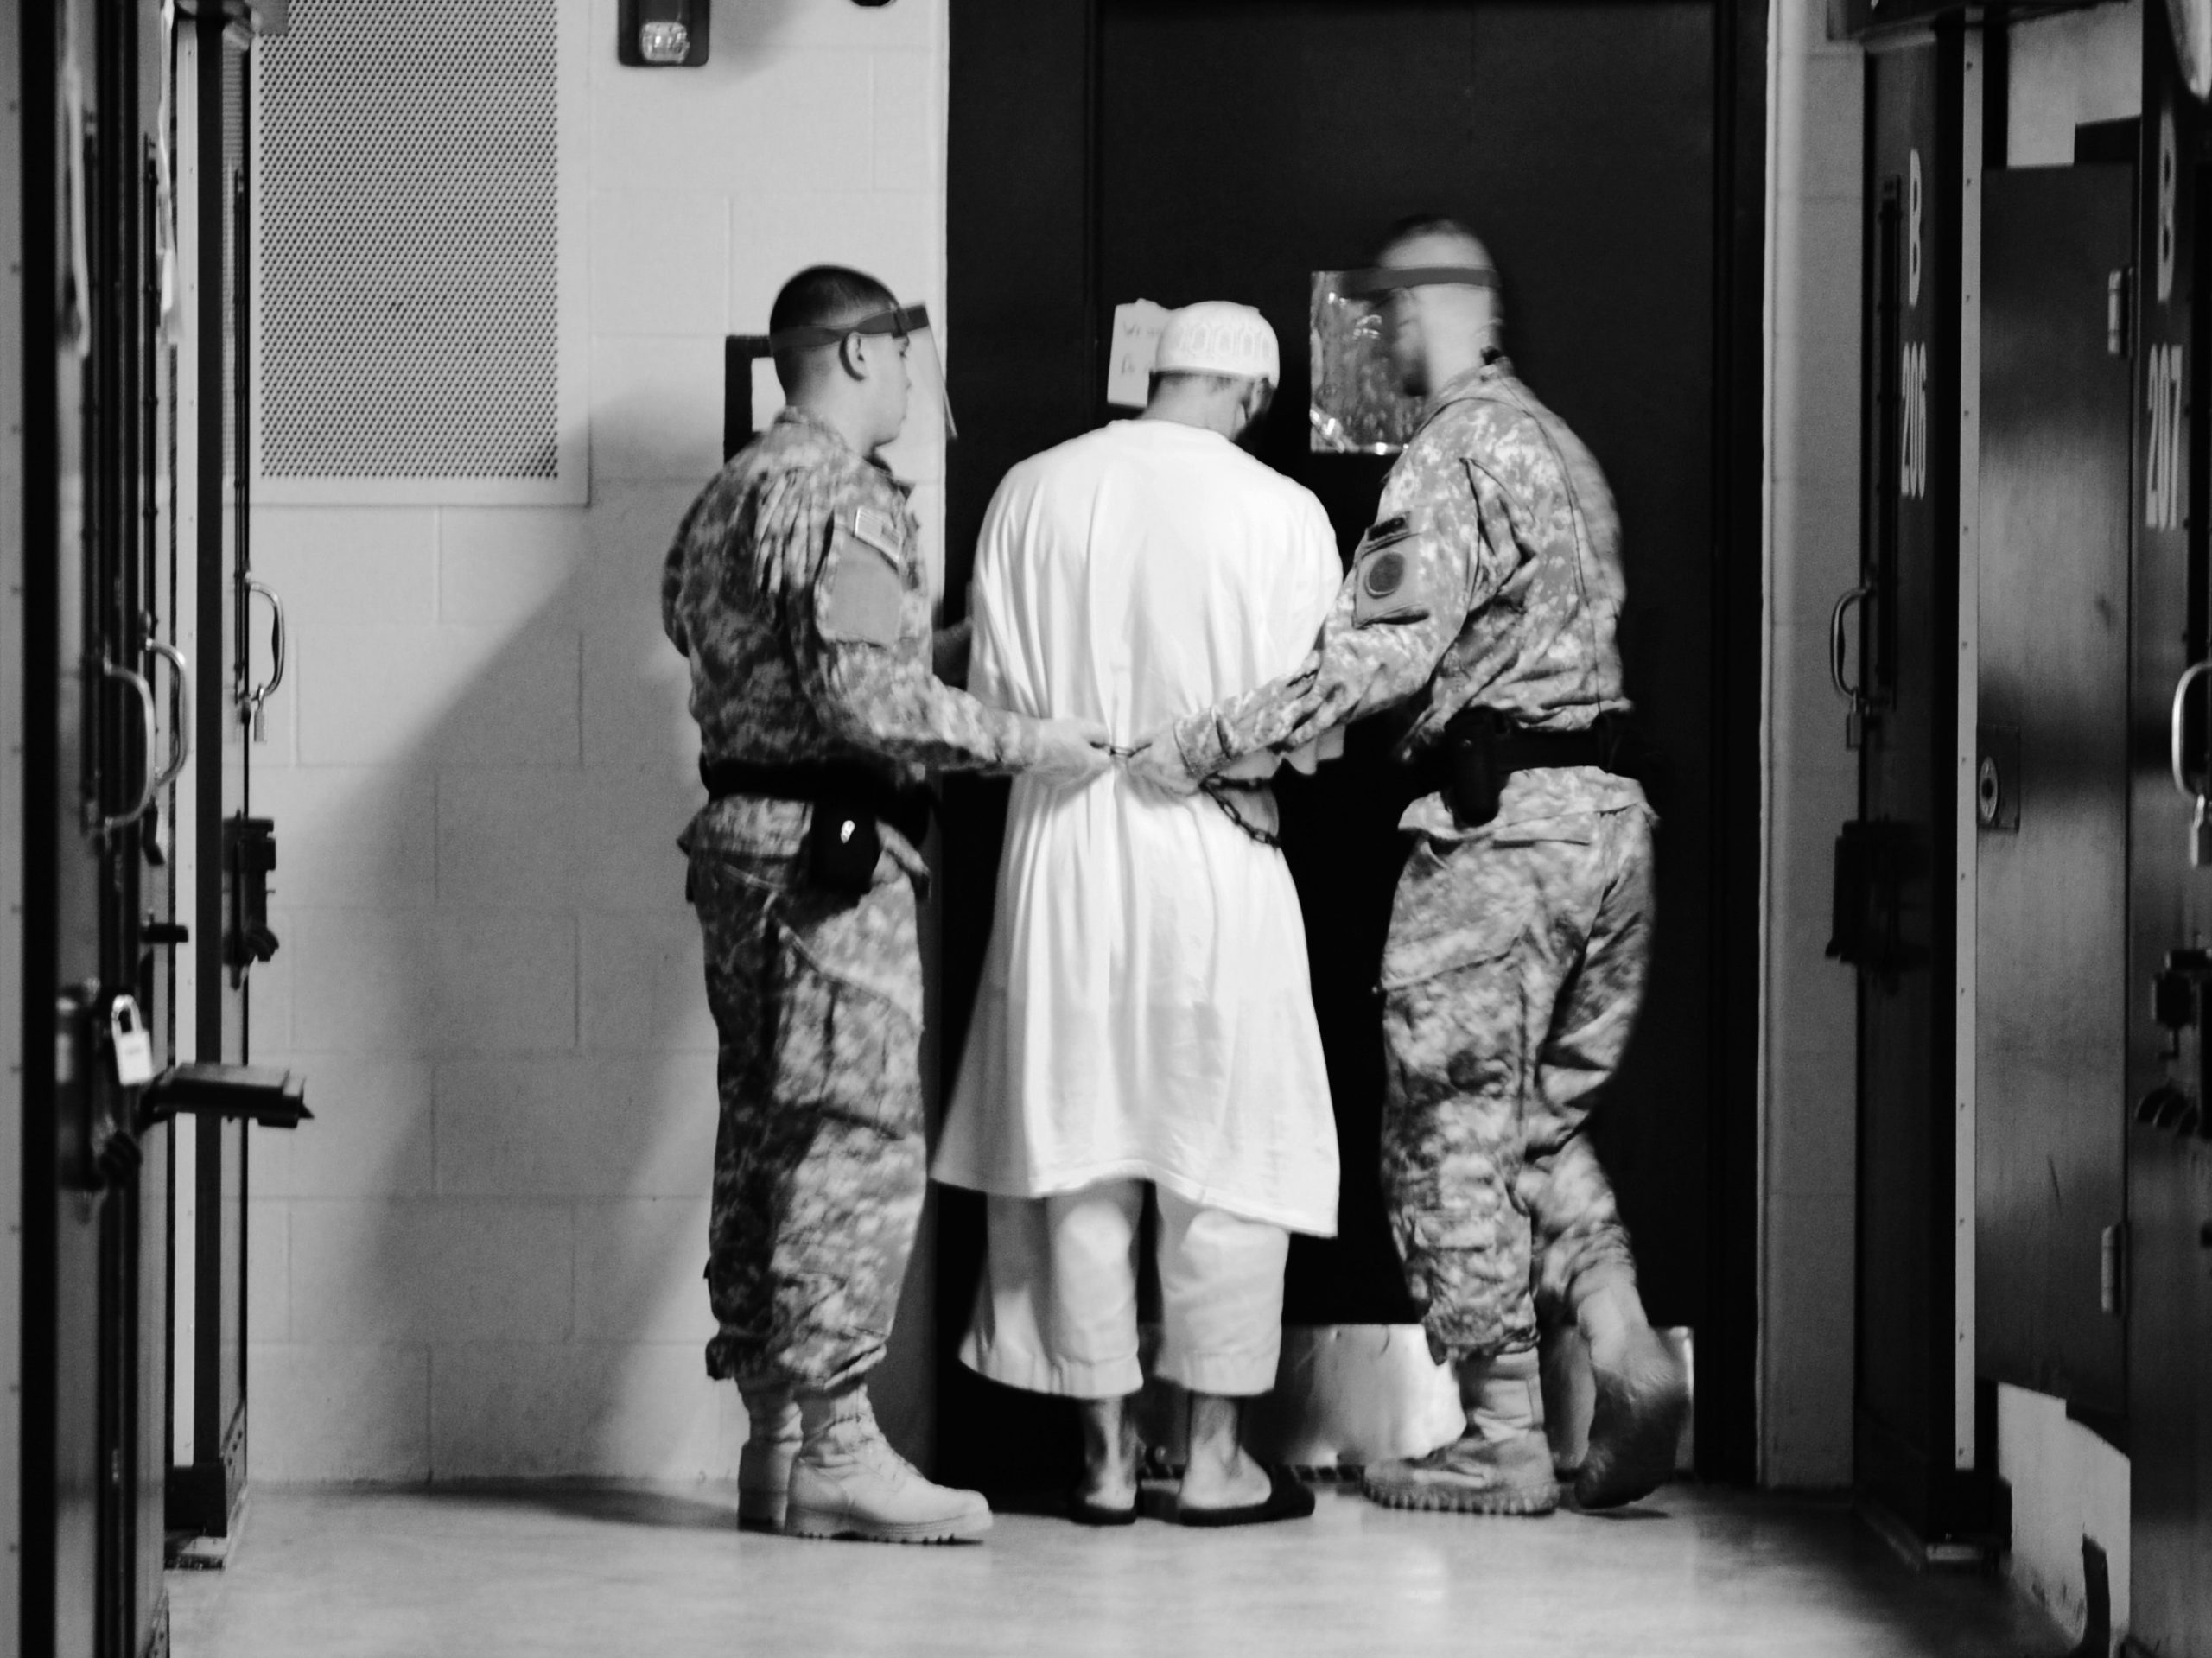 FAKTA: Guantanamos historie